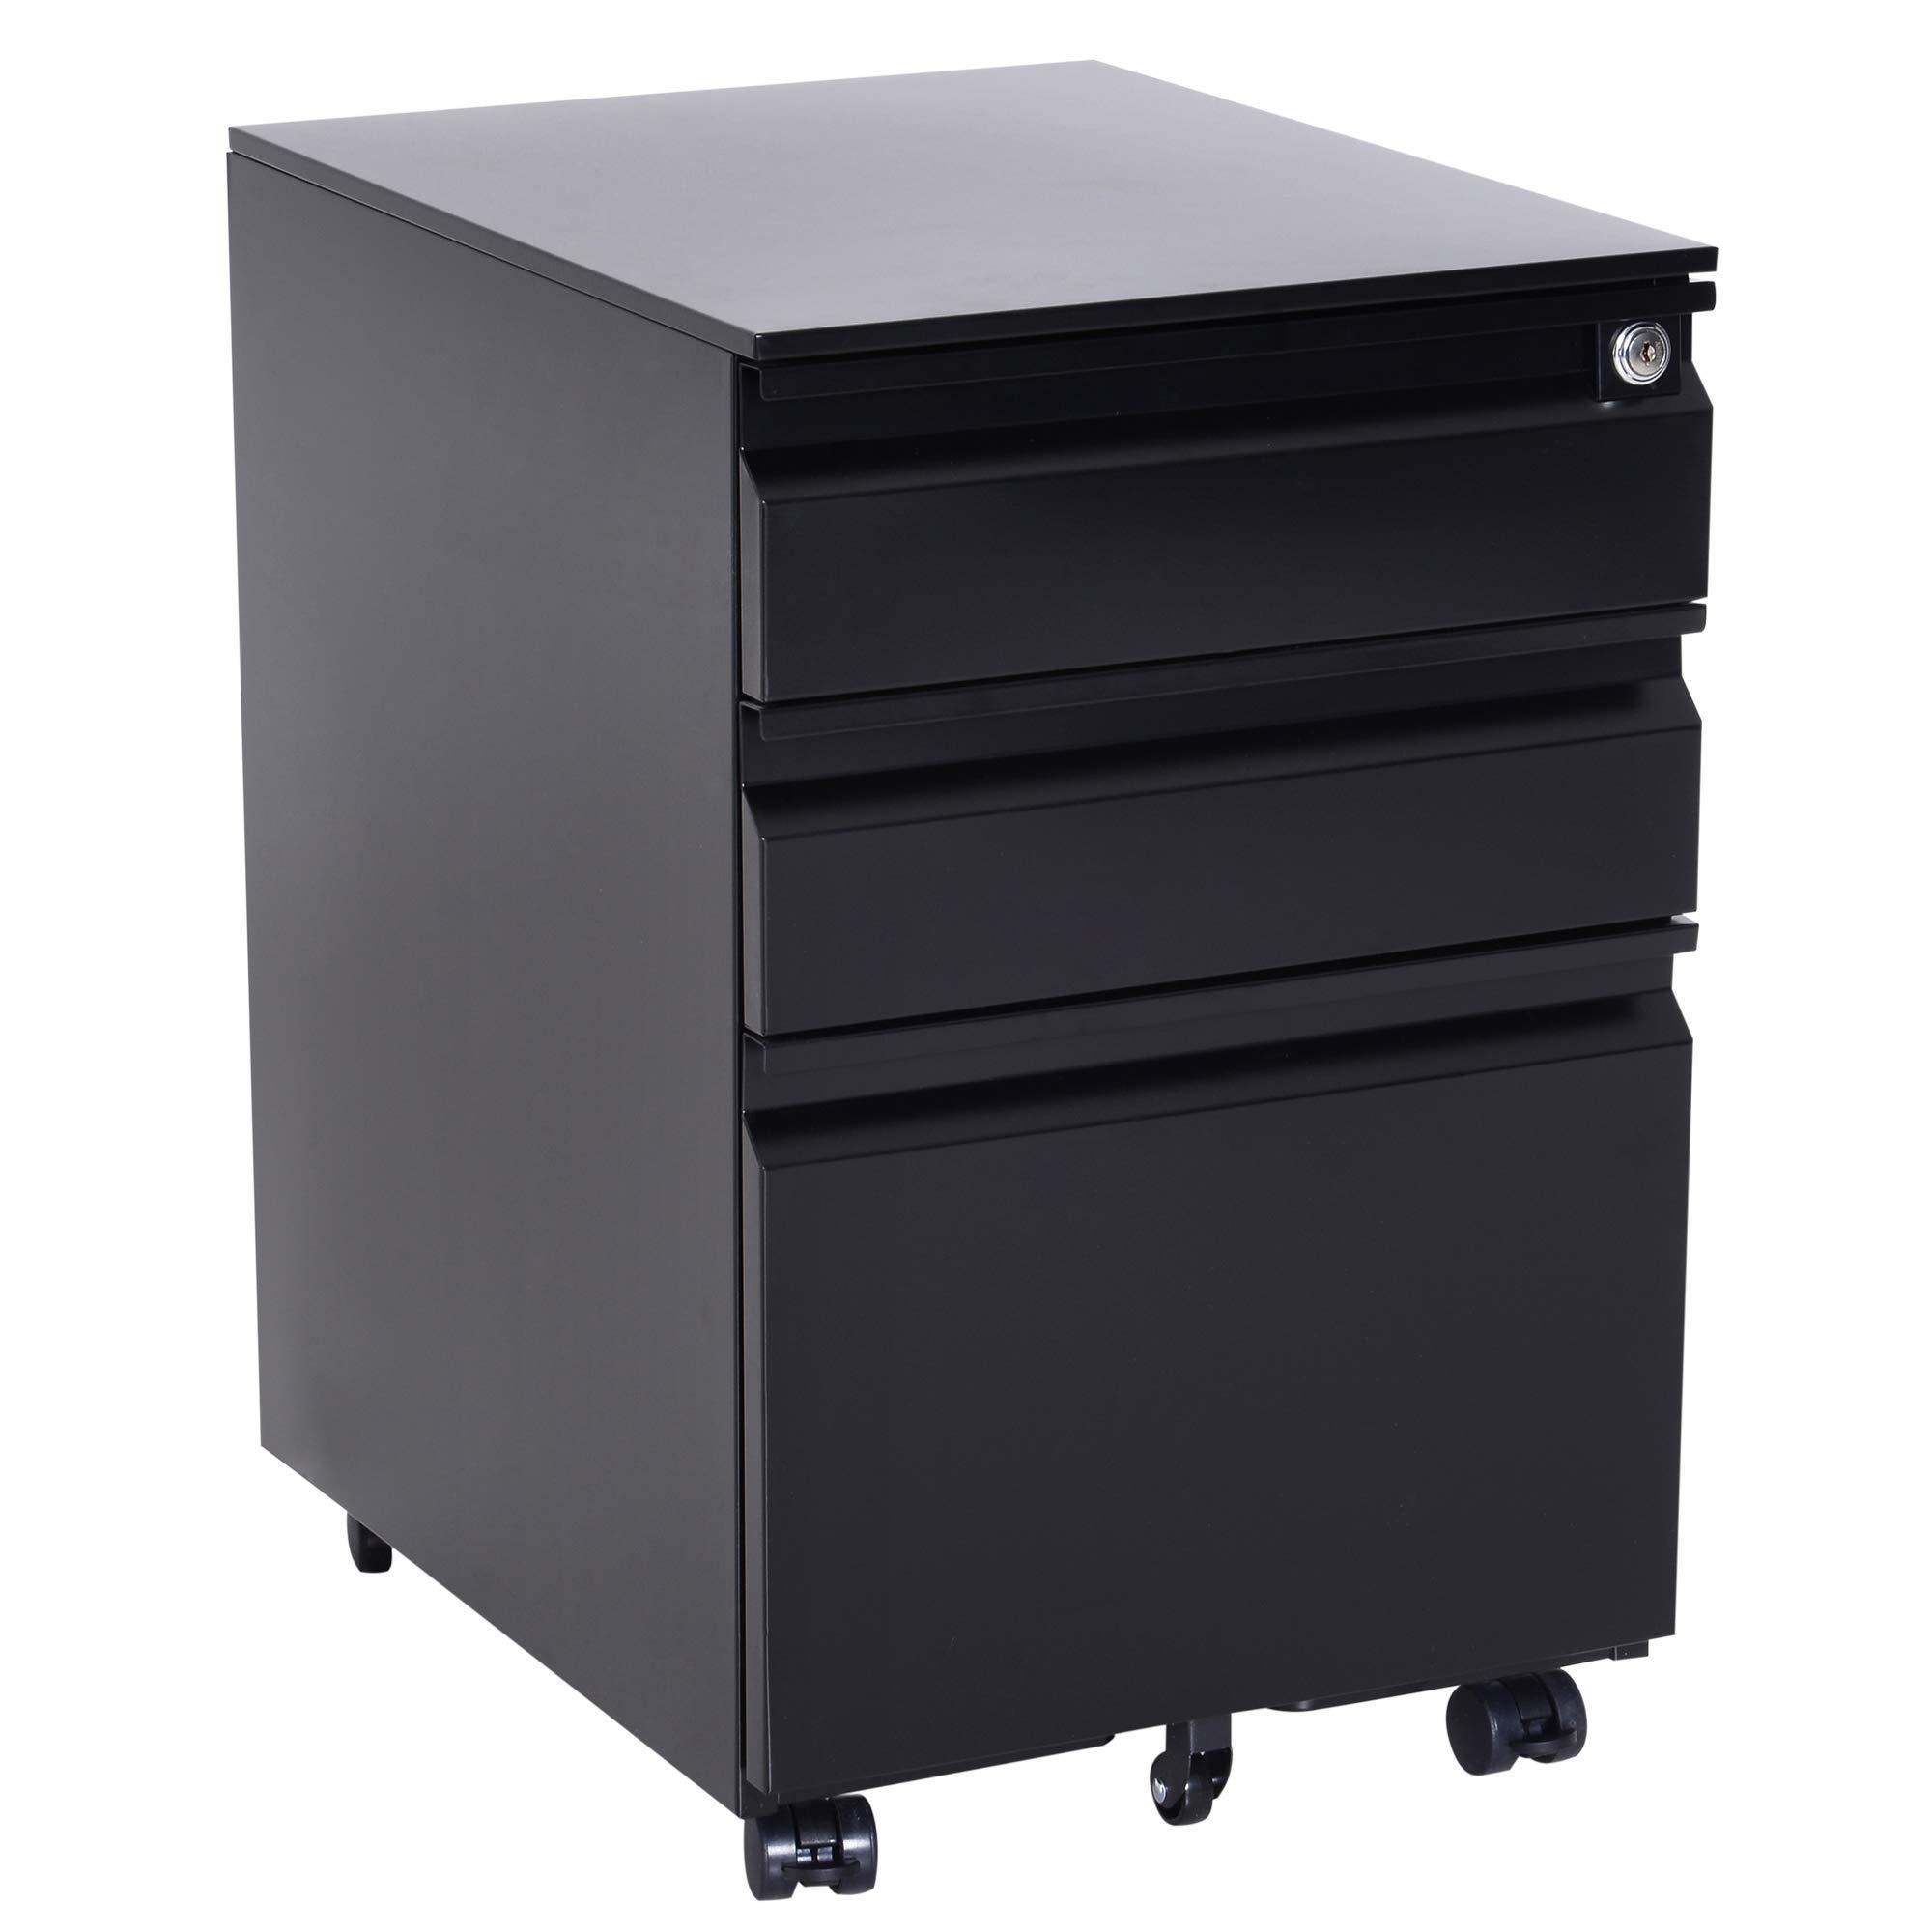 HOMCOM 24'' Steel 3 Drawer Locking File Cabinet on Wheels - Black by HOMCOM